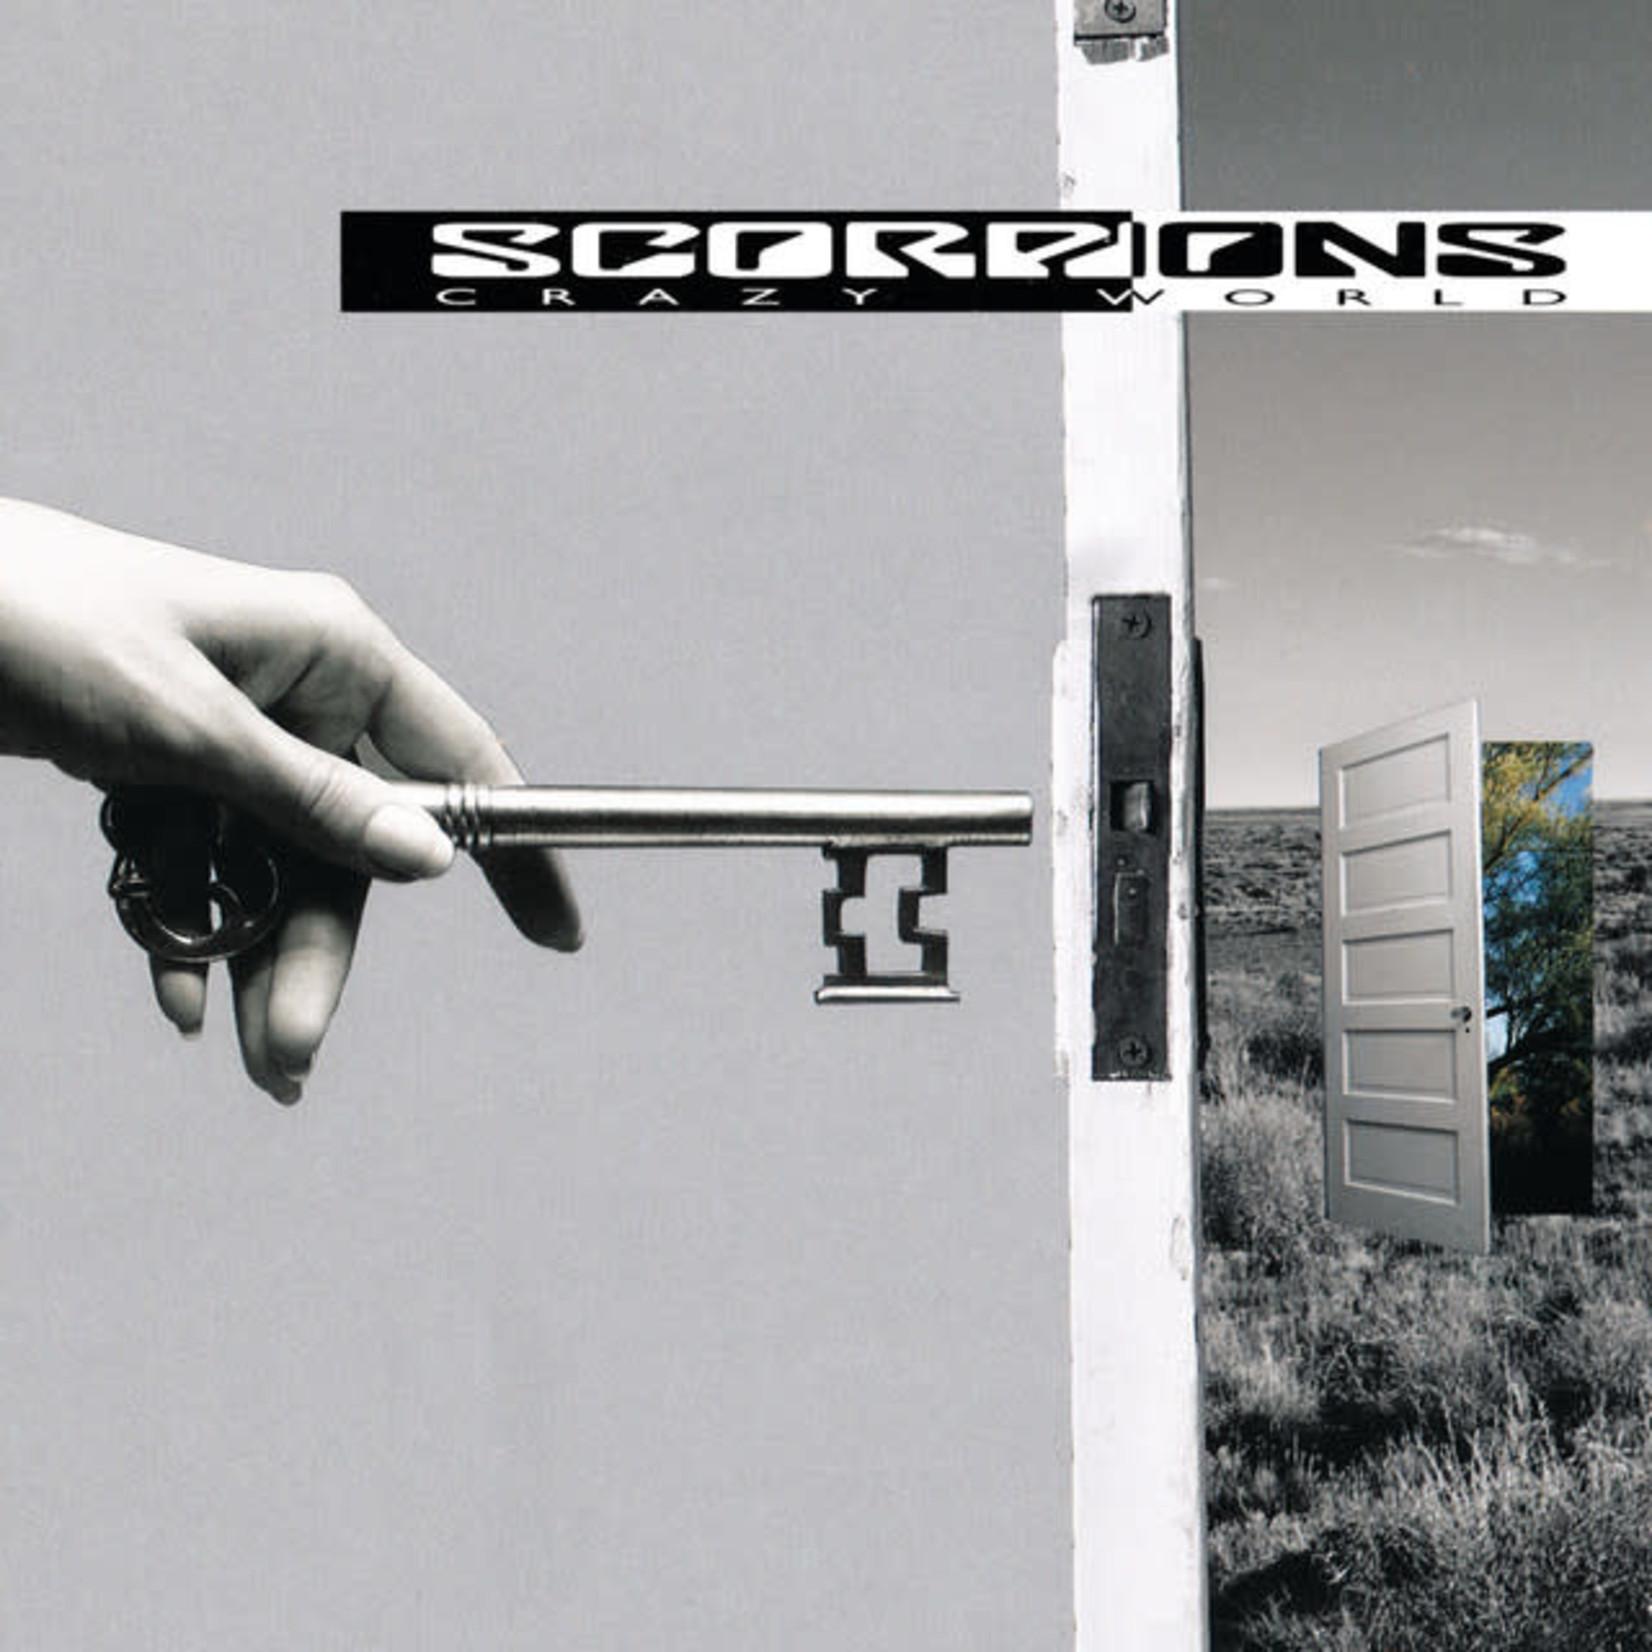 Vinyl Scorpions - Crazy World